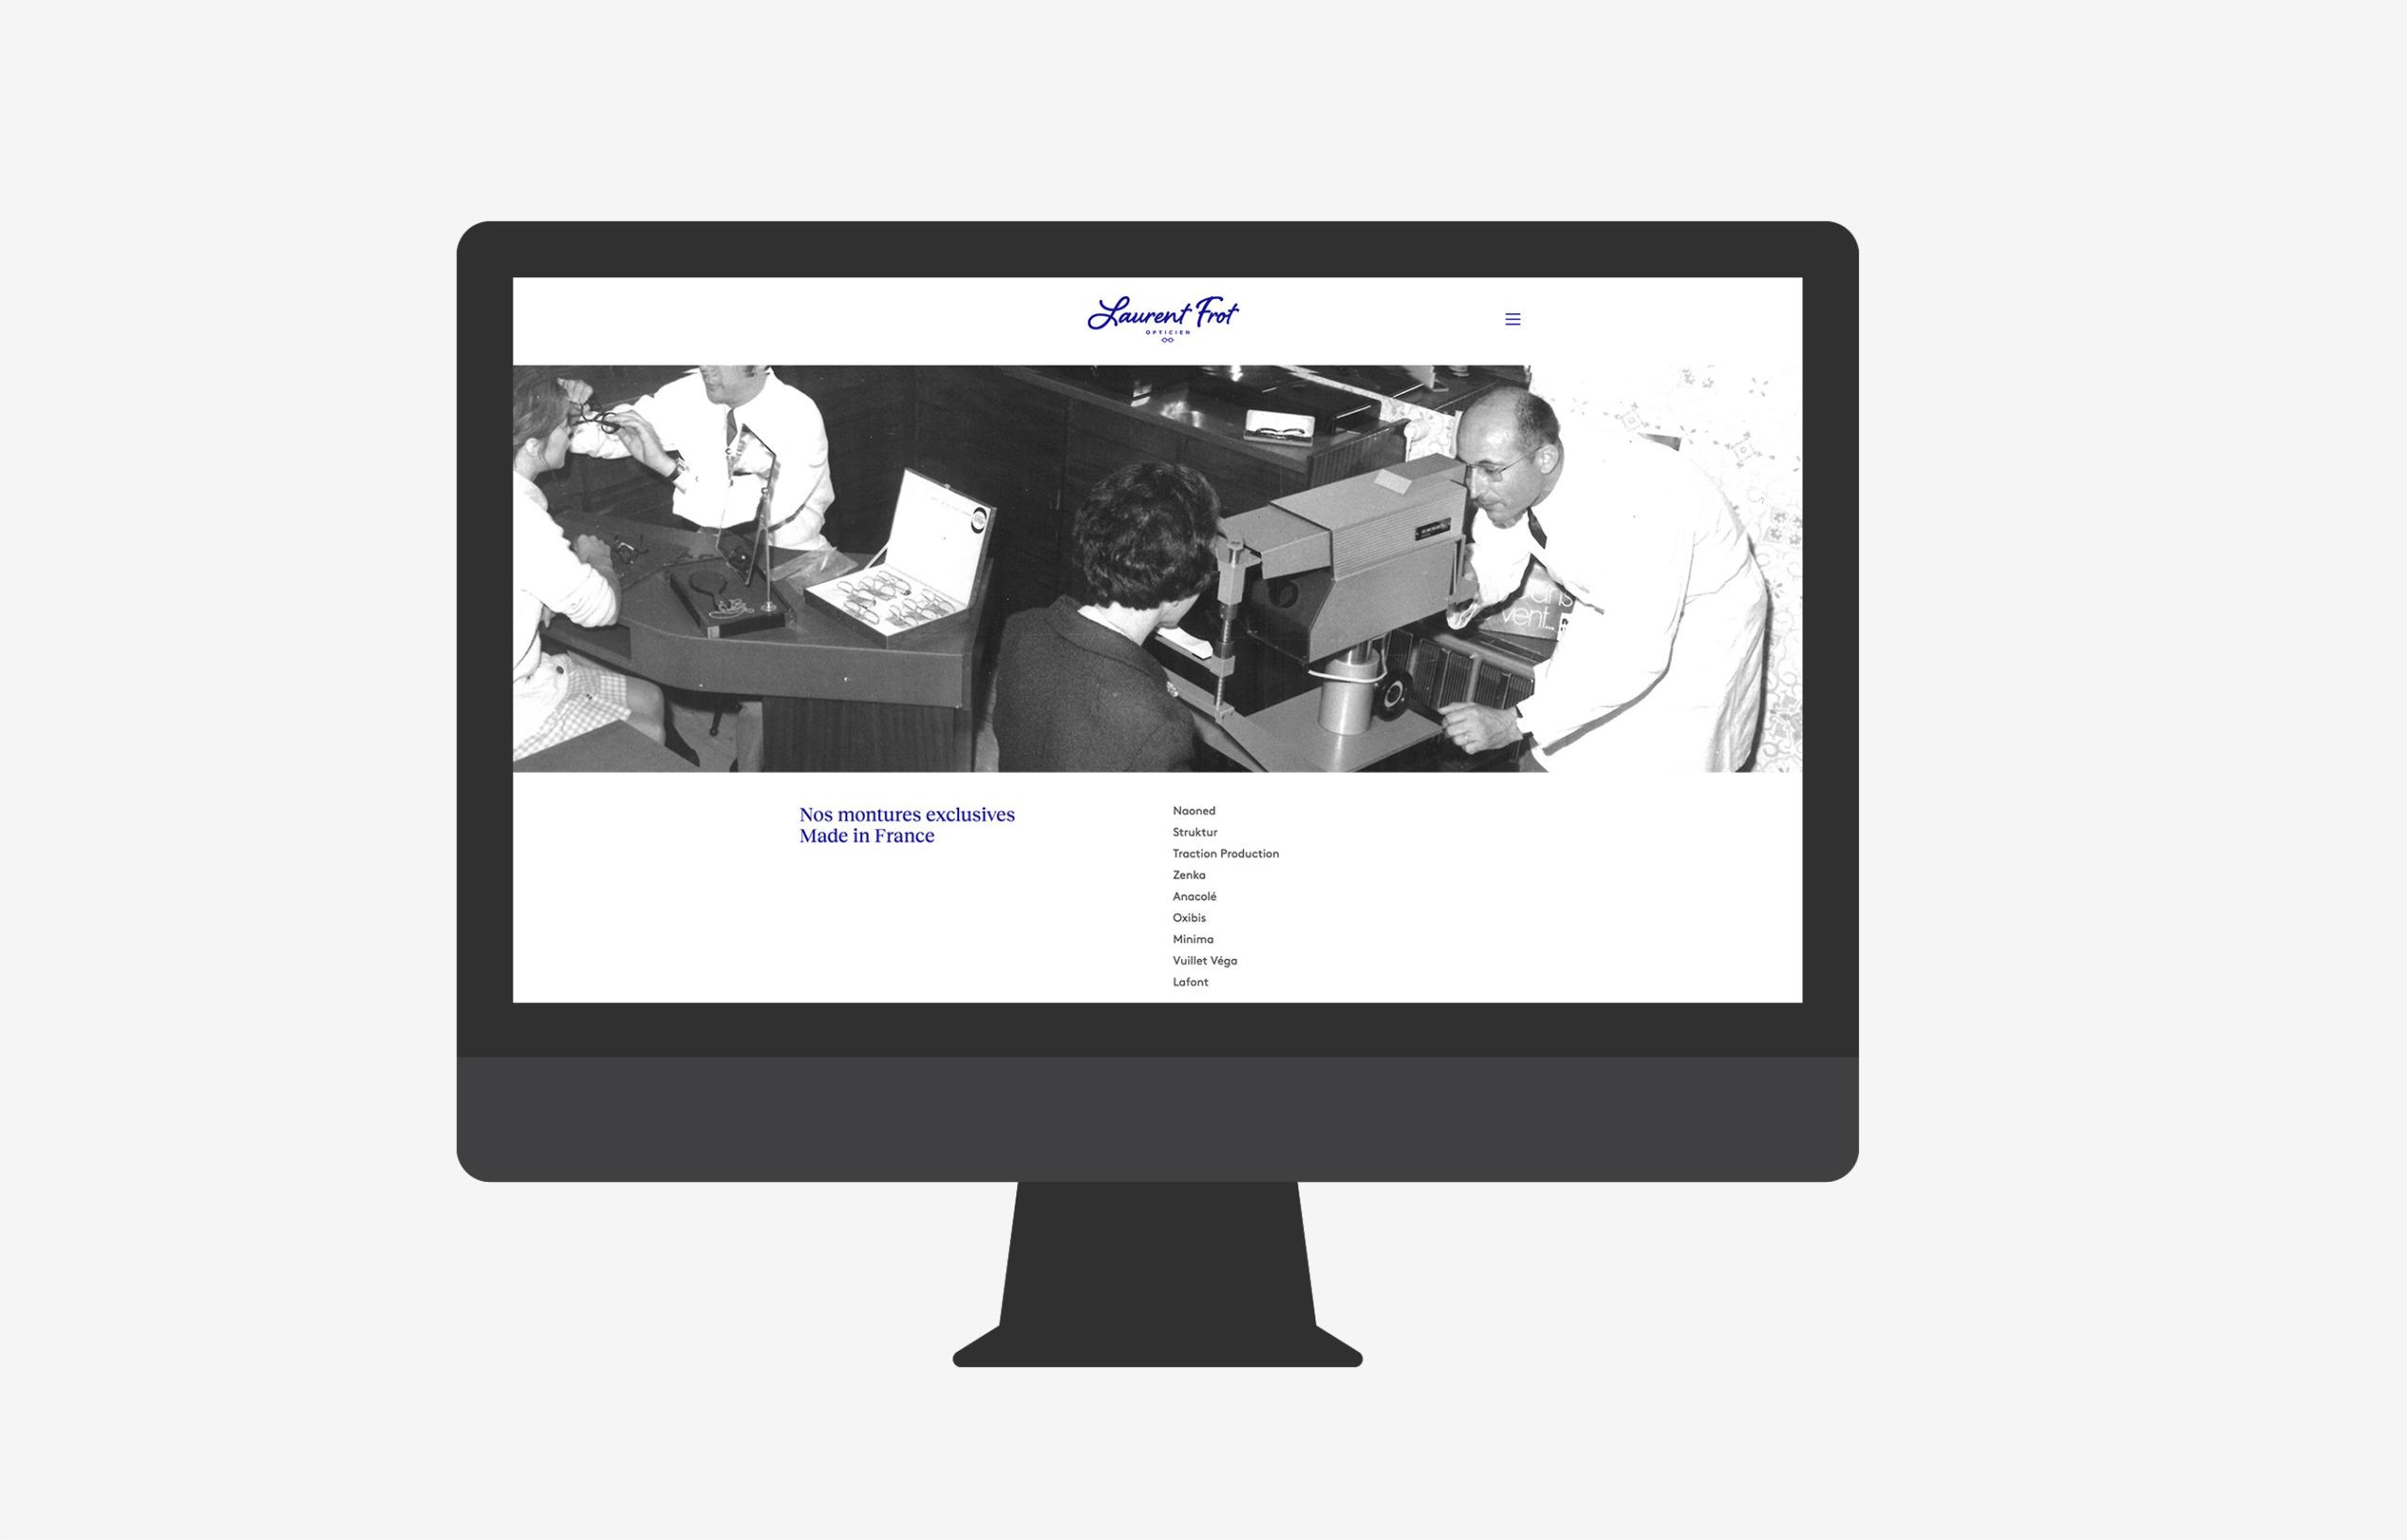 04-web-lfo-pikteo-webdesign-graphic-design-freelance-paris-bruxelles-londres